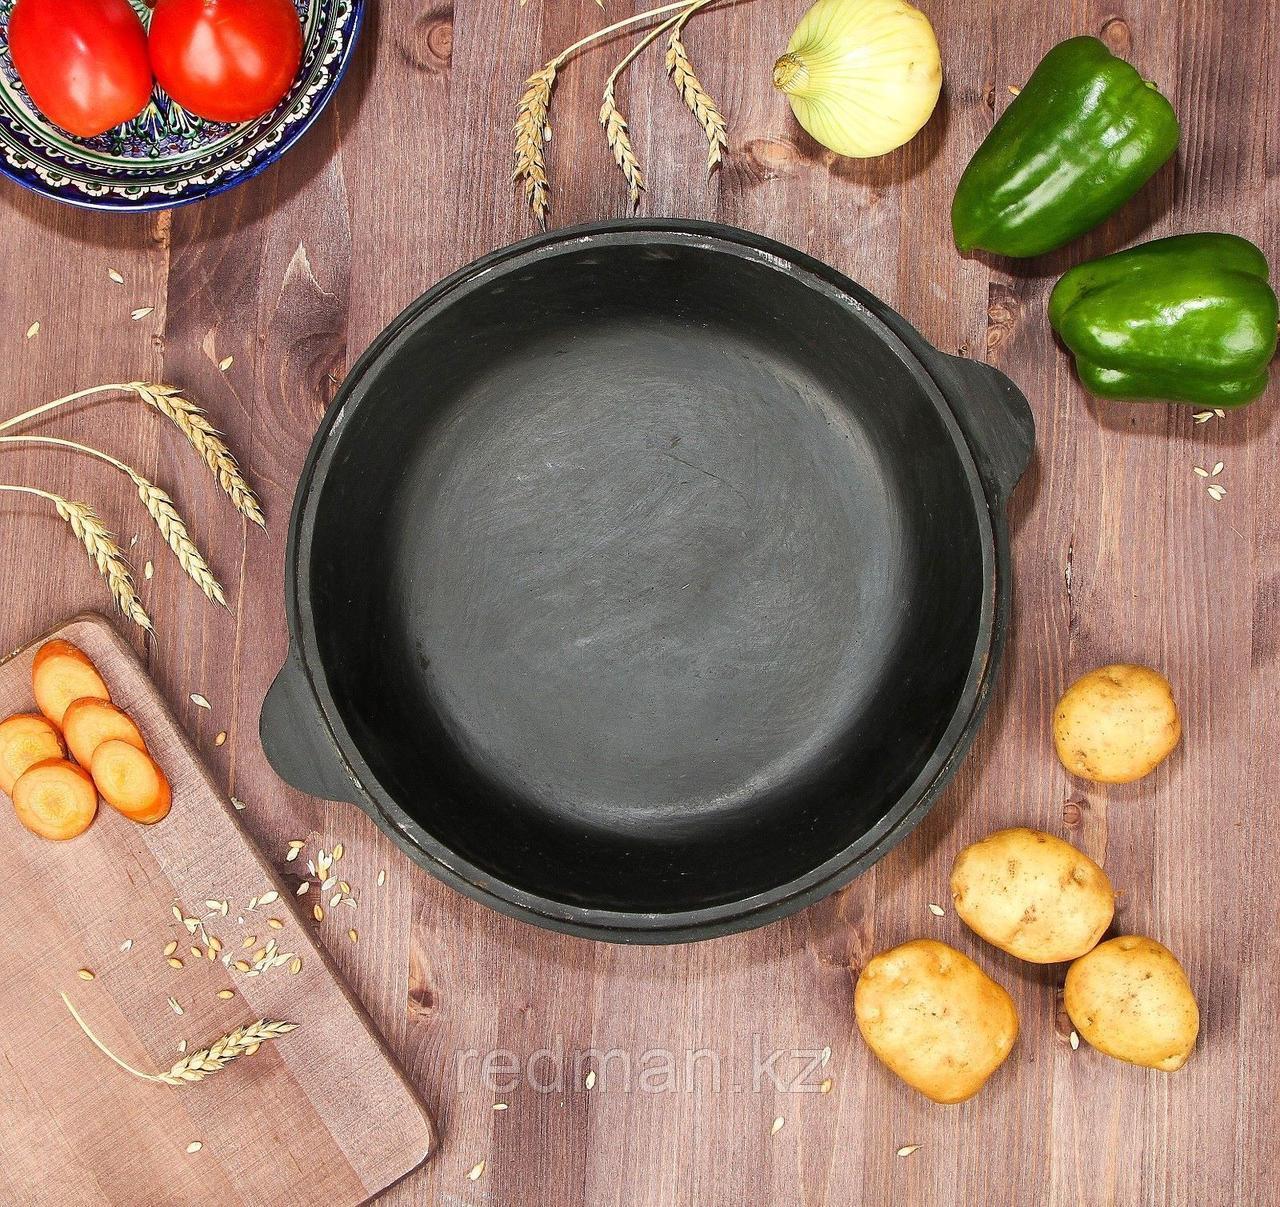 Сковорода-крышка чугунная 6 л